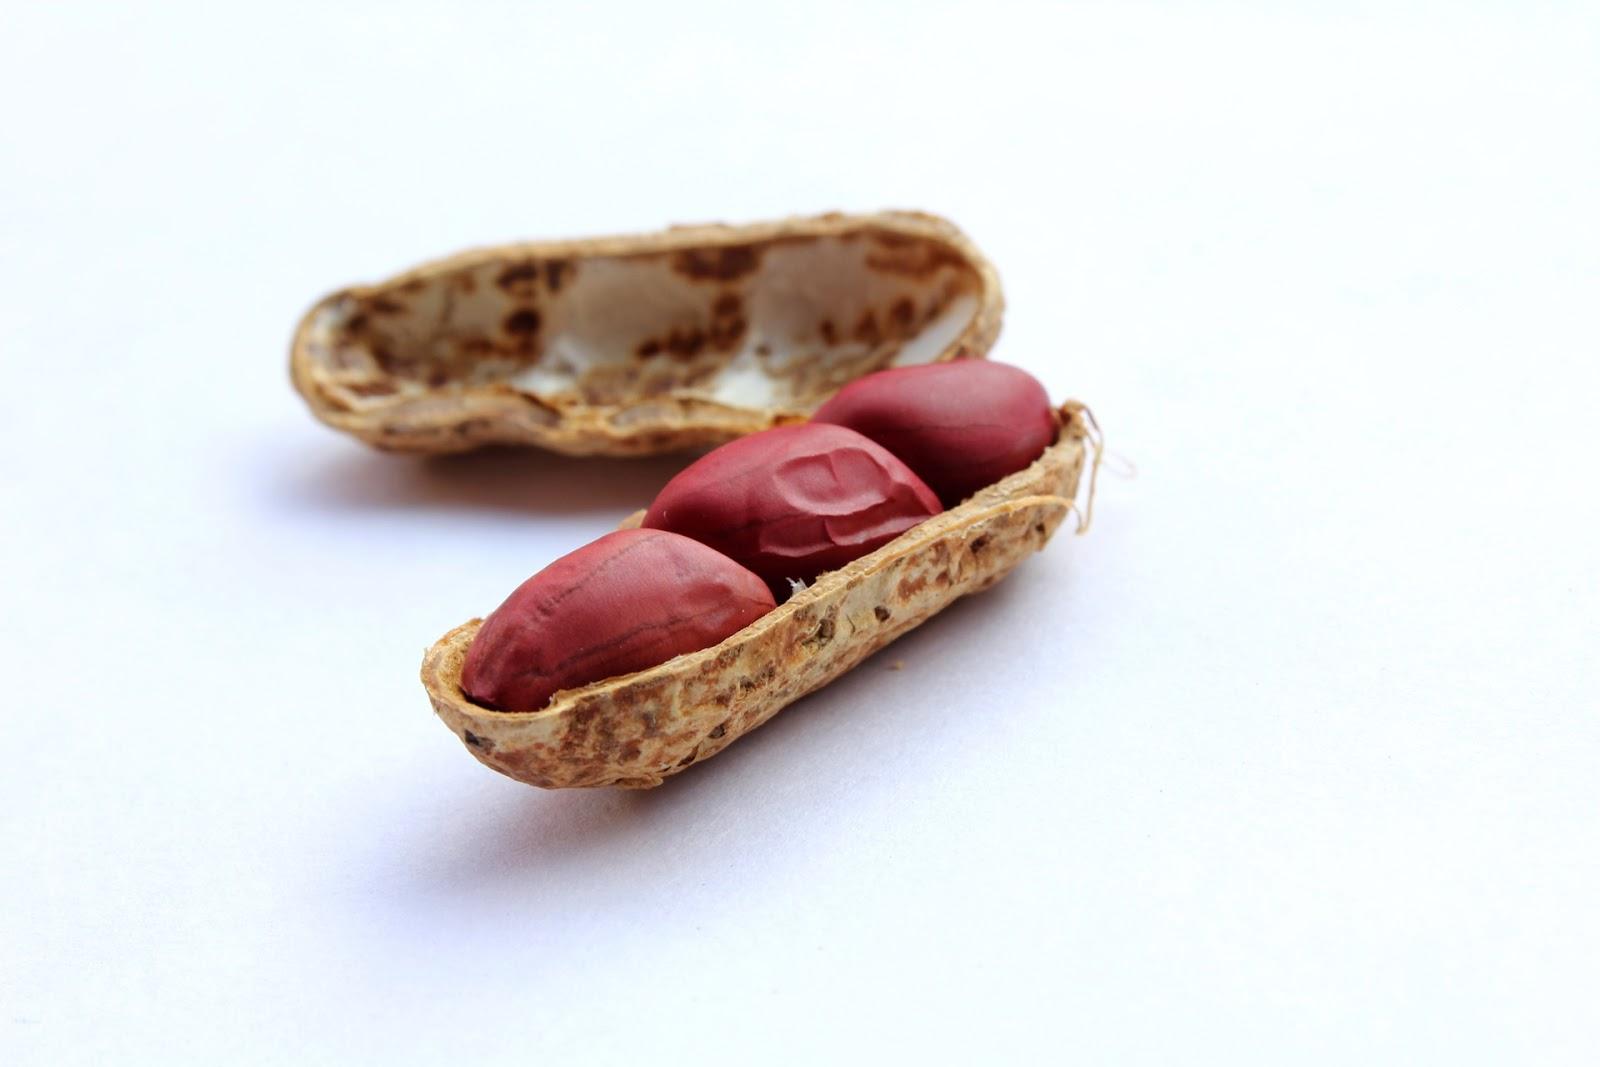 amendoim faz mal